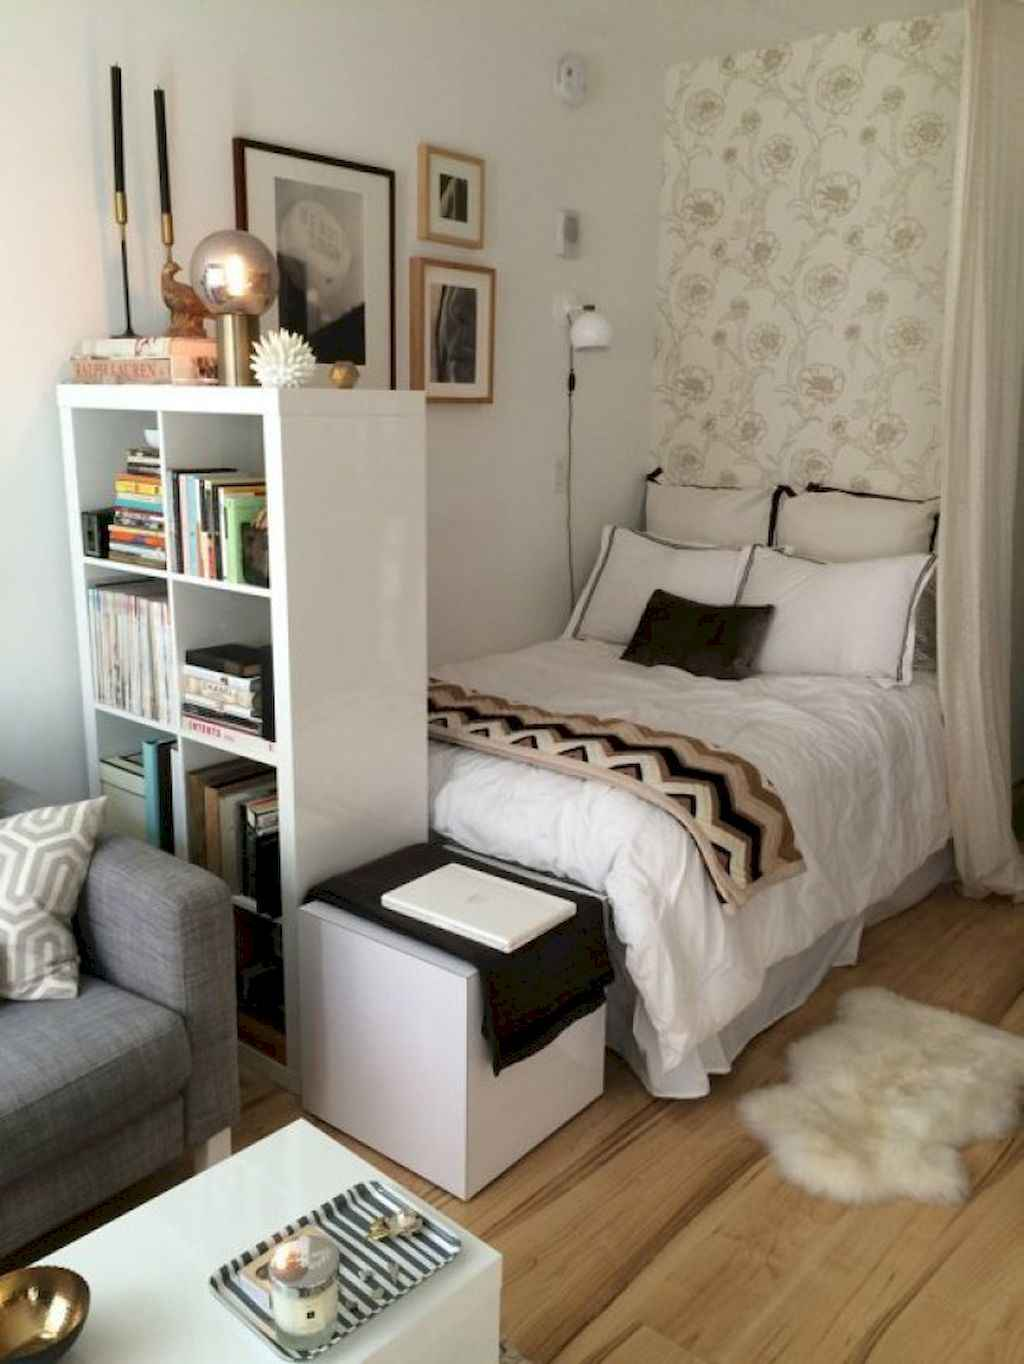 Small apartment decorating ideas (72)